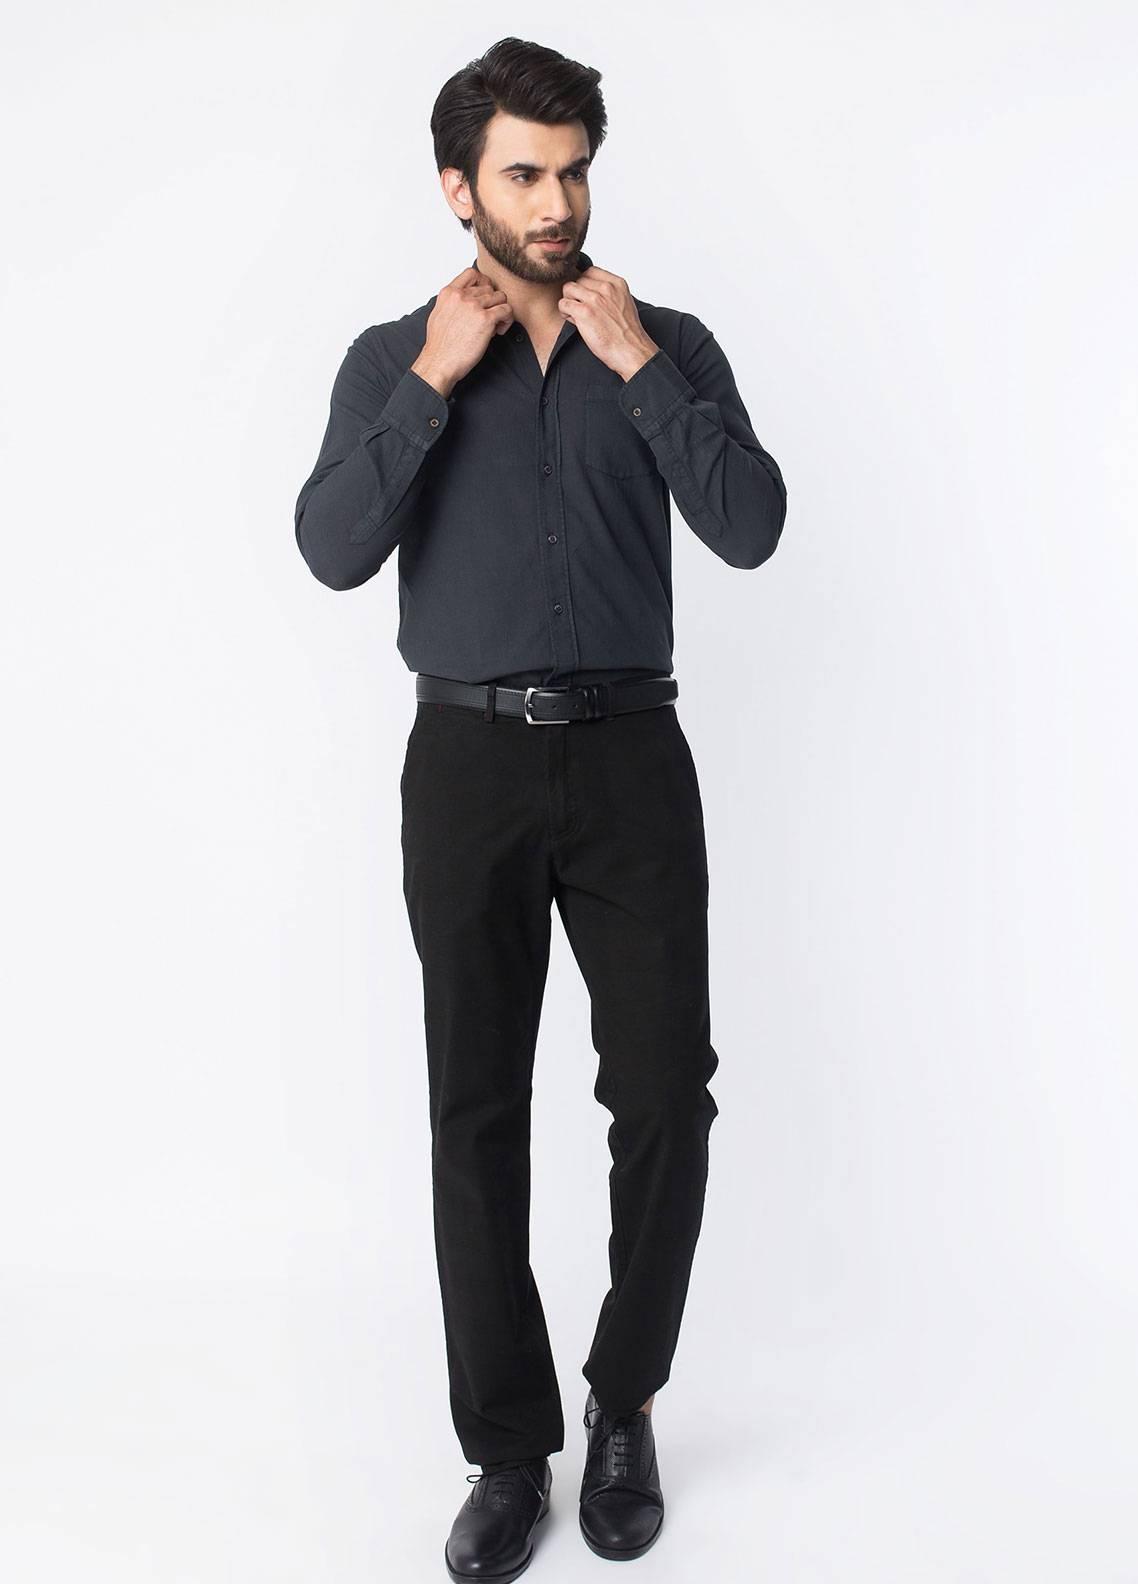 Brumano Cotton Formal Men Trousers -  BRM-50-007-Black